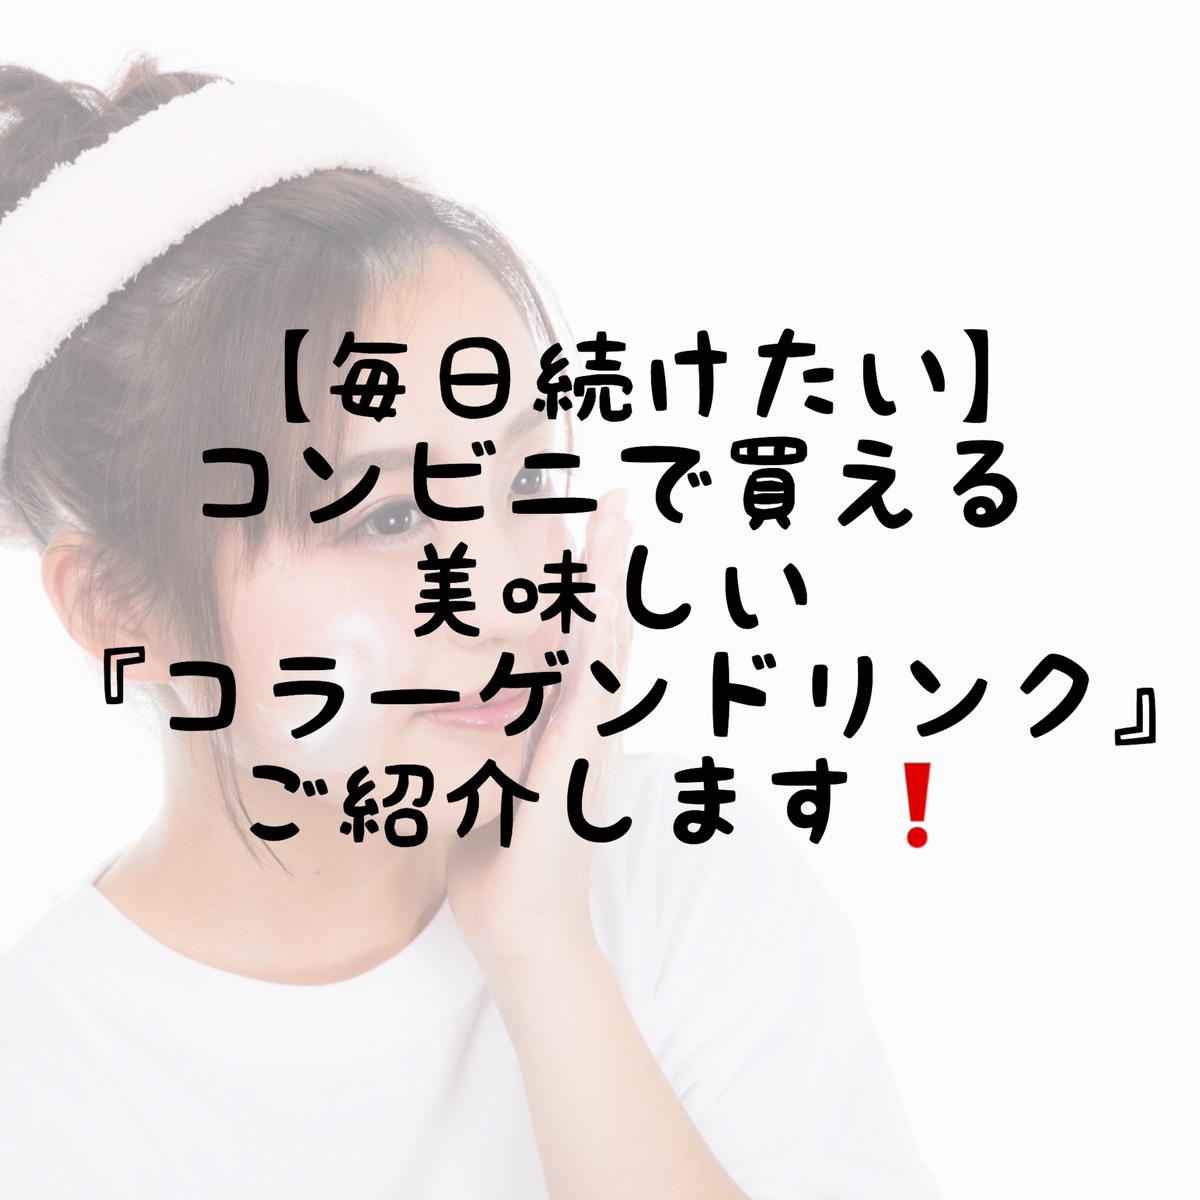 f:id:nokonoko_o:20200607154710j:plain